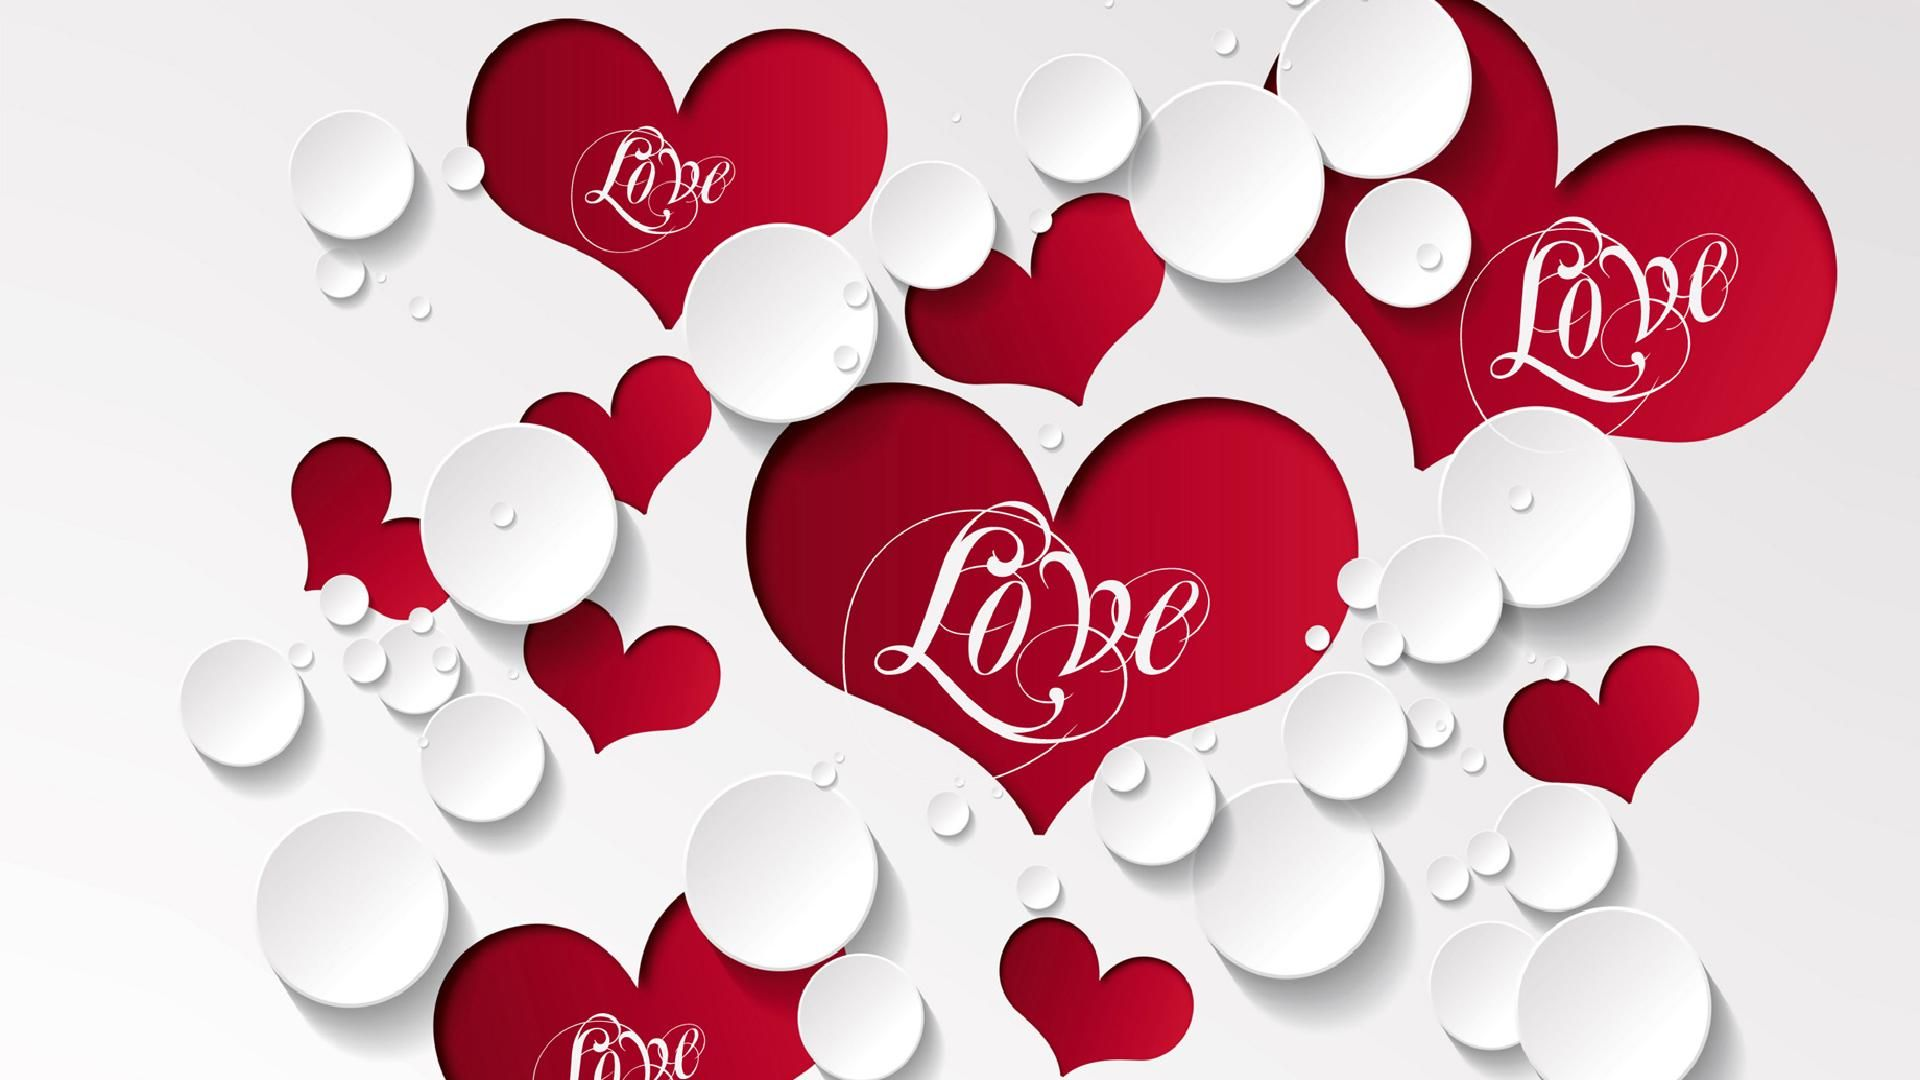 Heart full hd wallpaper